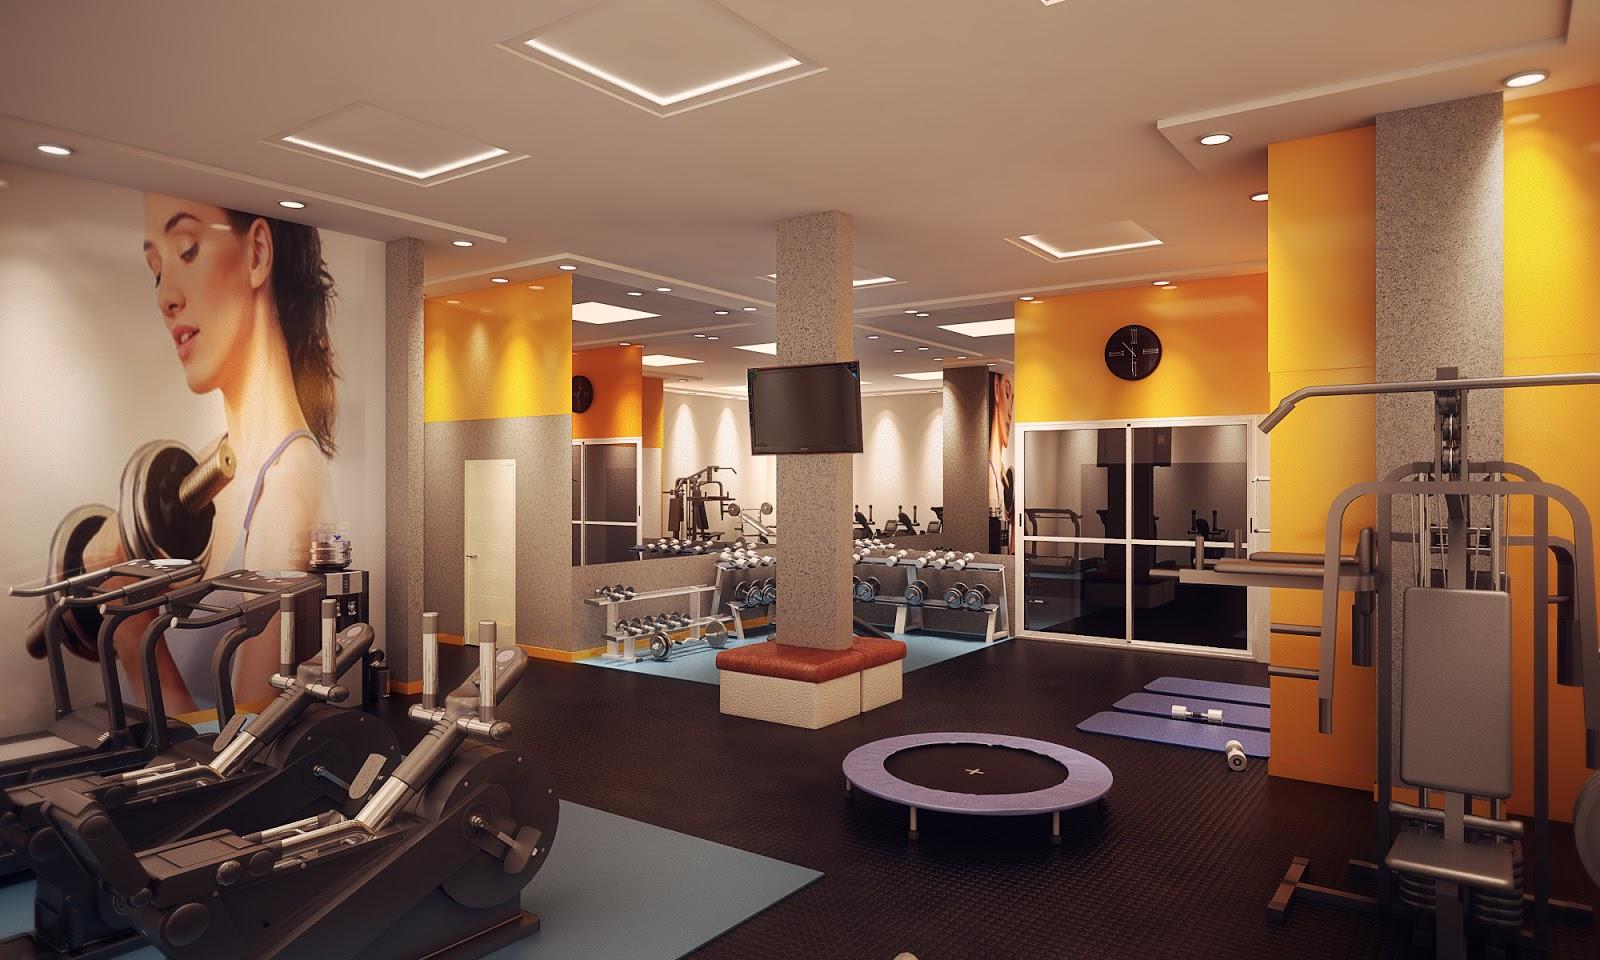 de interiores academias: Maquete Eletrônica 3D: Projeto Academia  #BC920F 1600 960